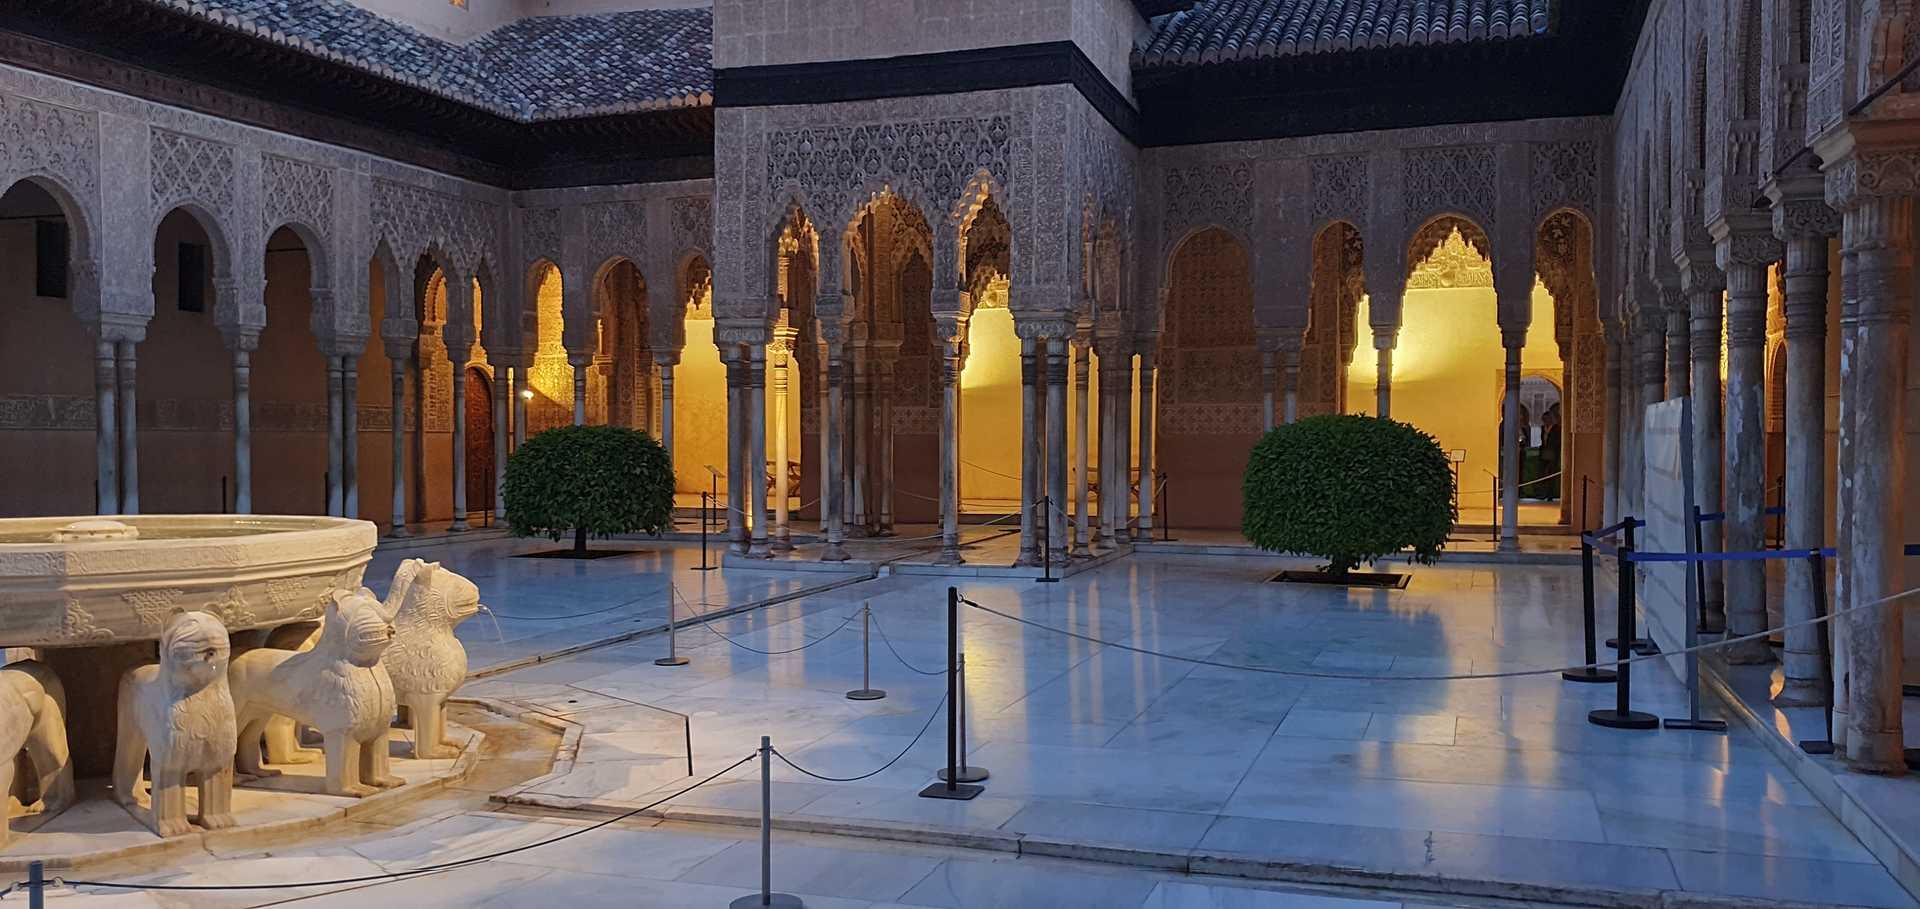 Visita guiada a la Alhambra de Granada